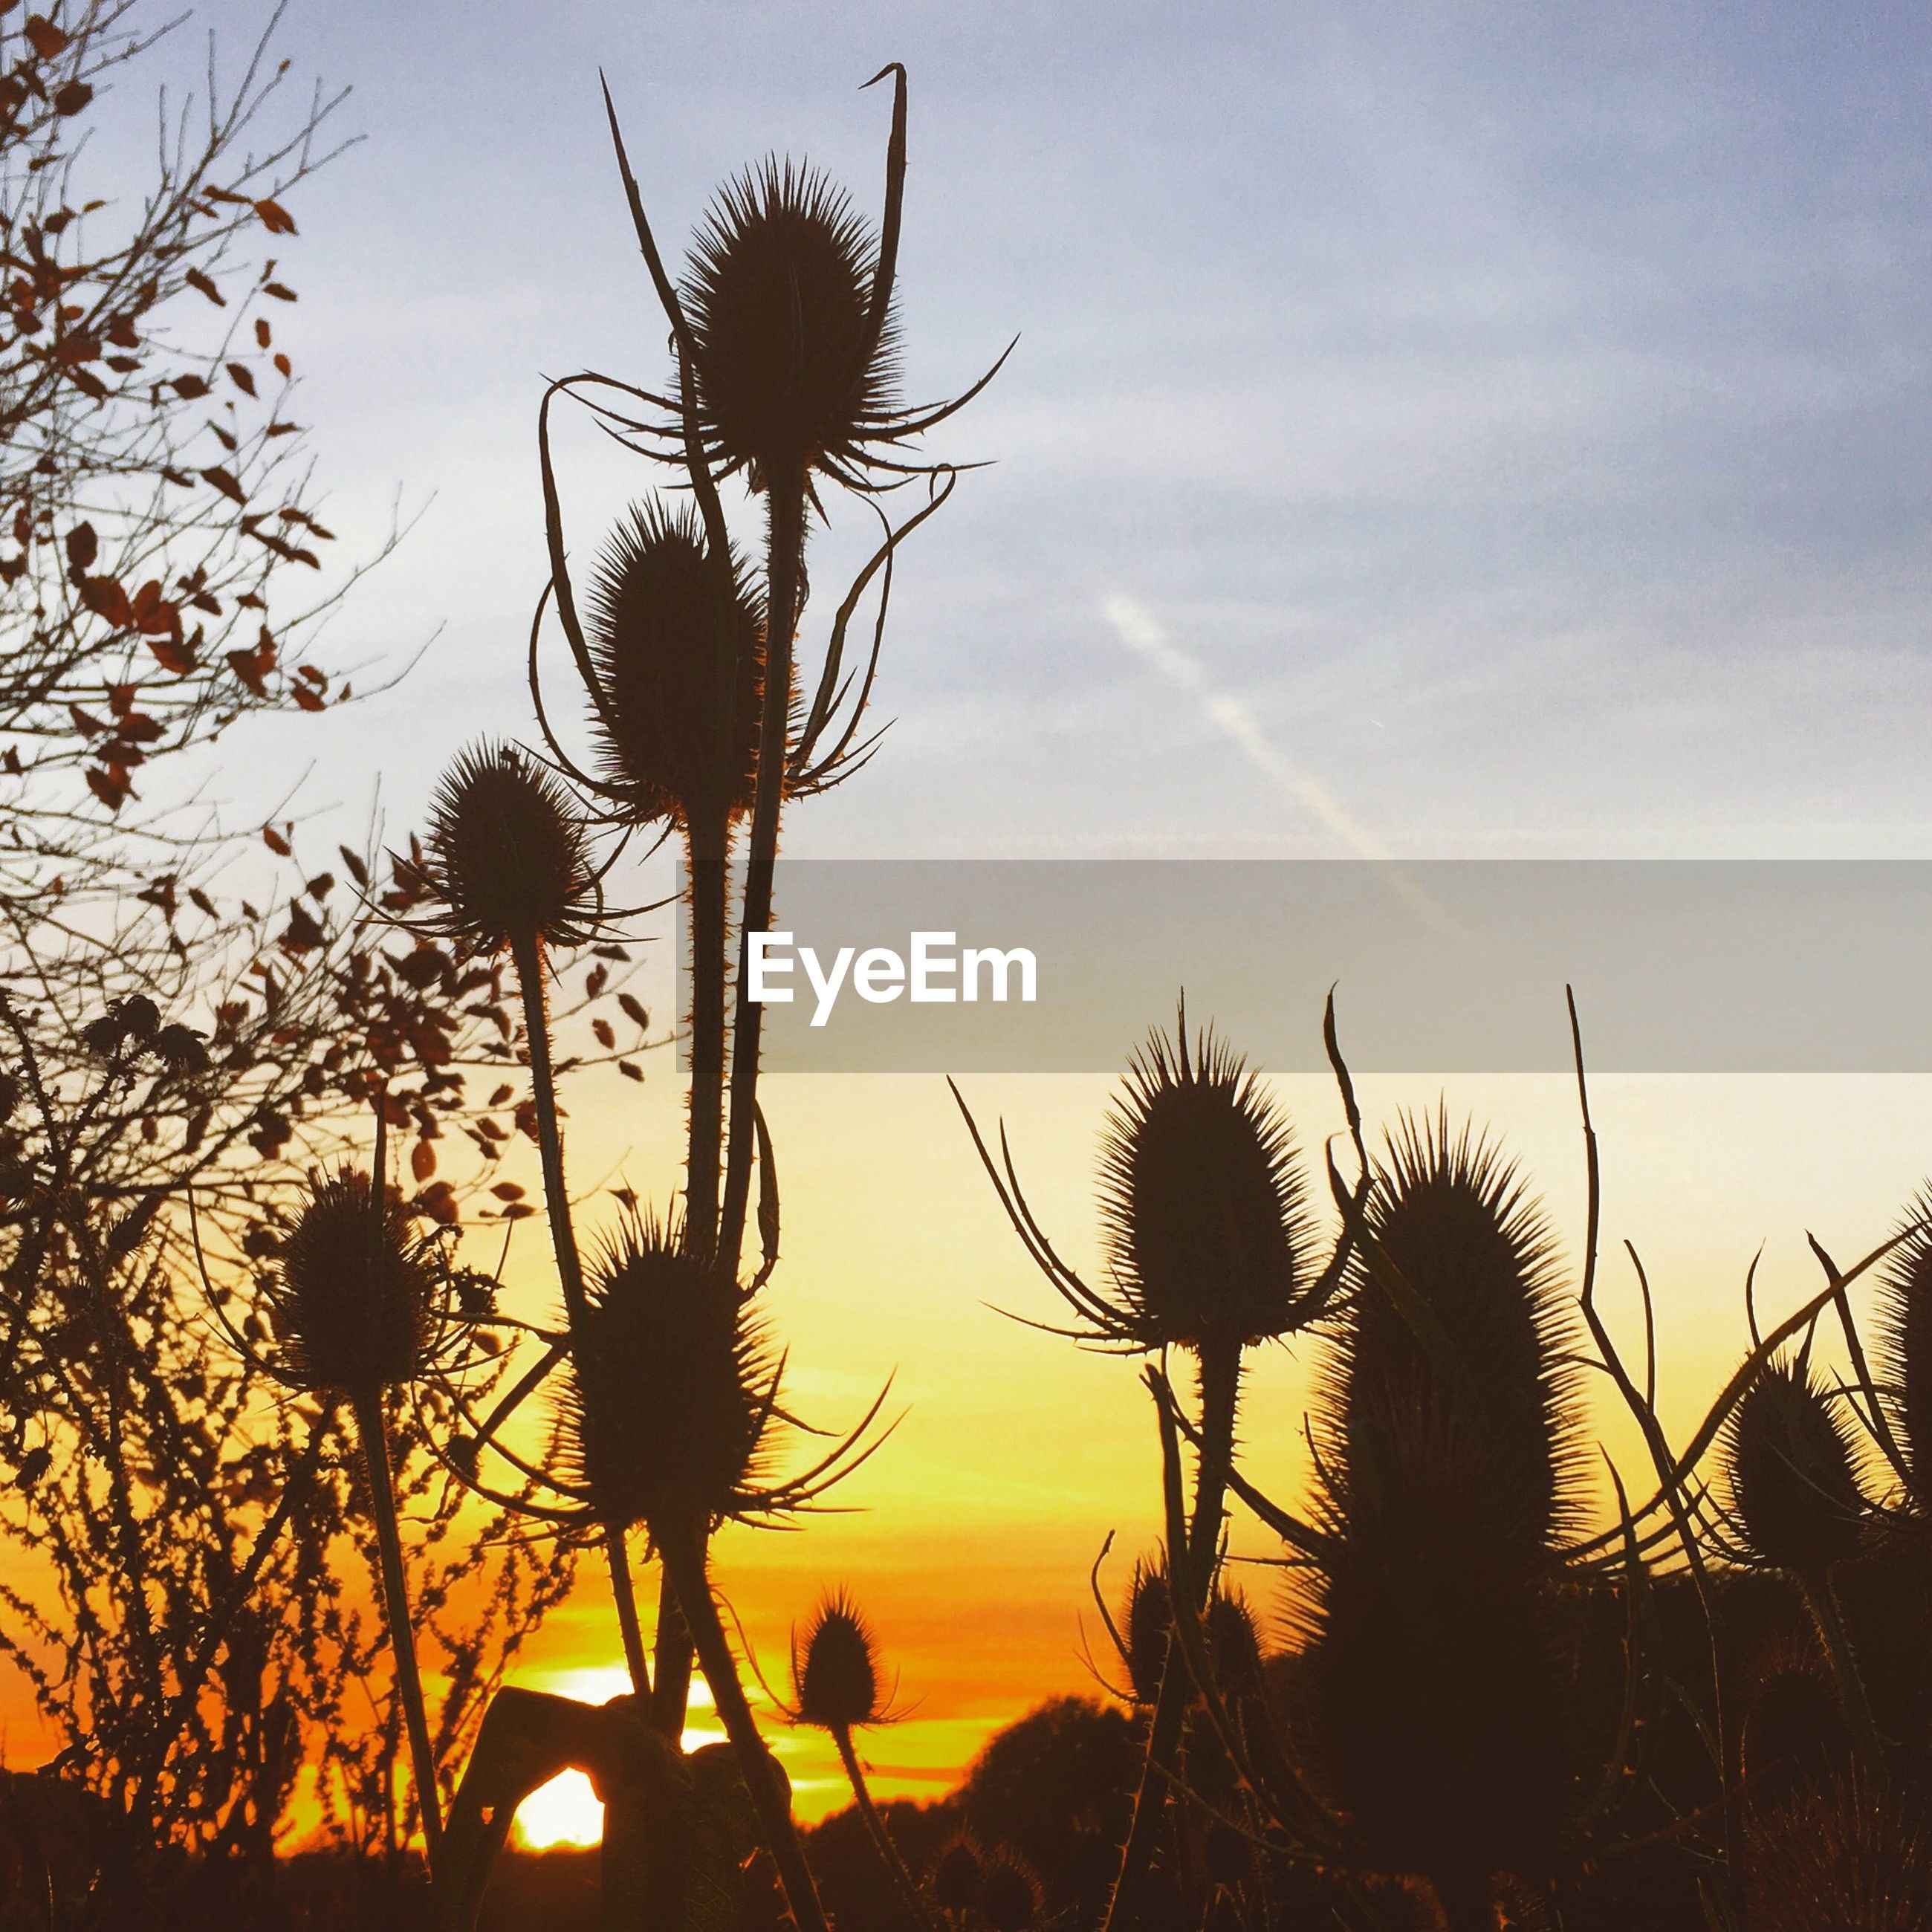 Silhouette thistle flowers against sunset sky